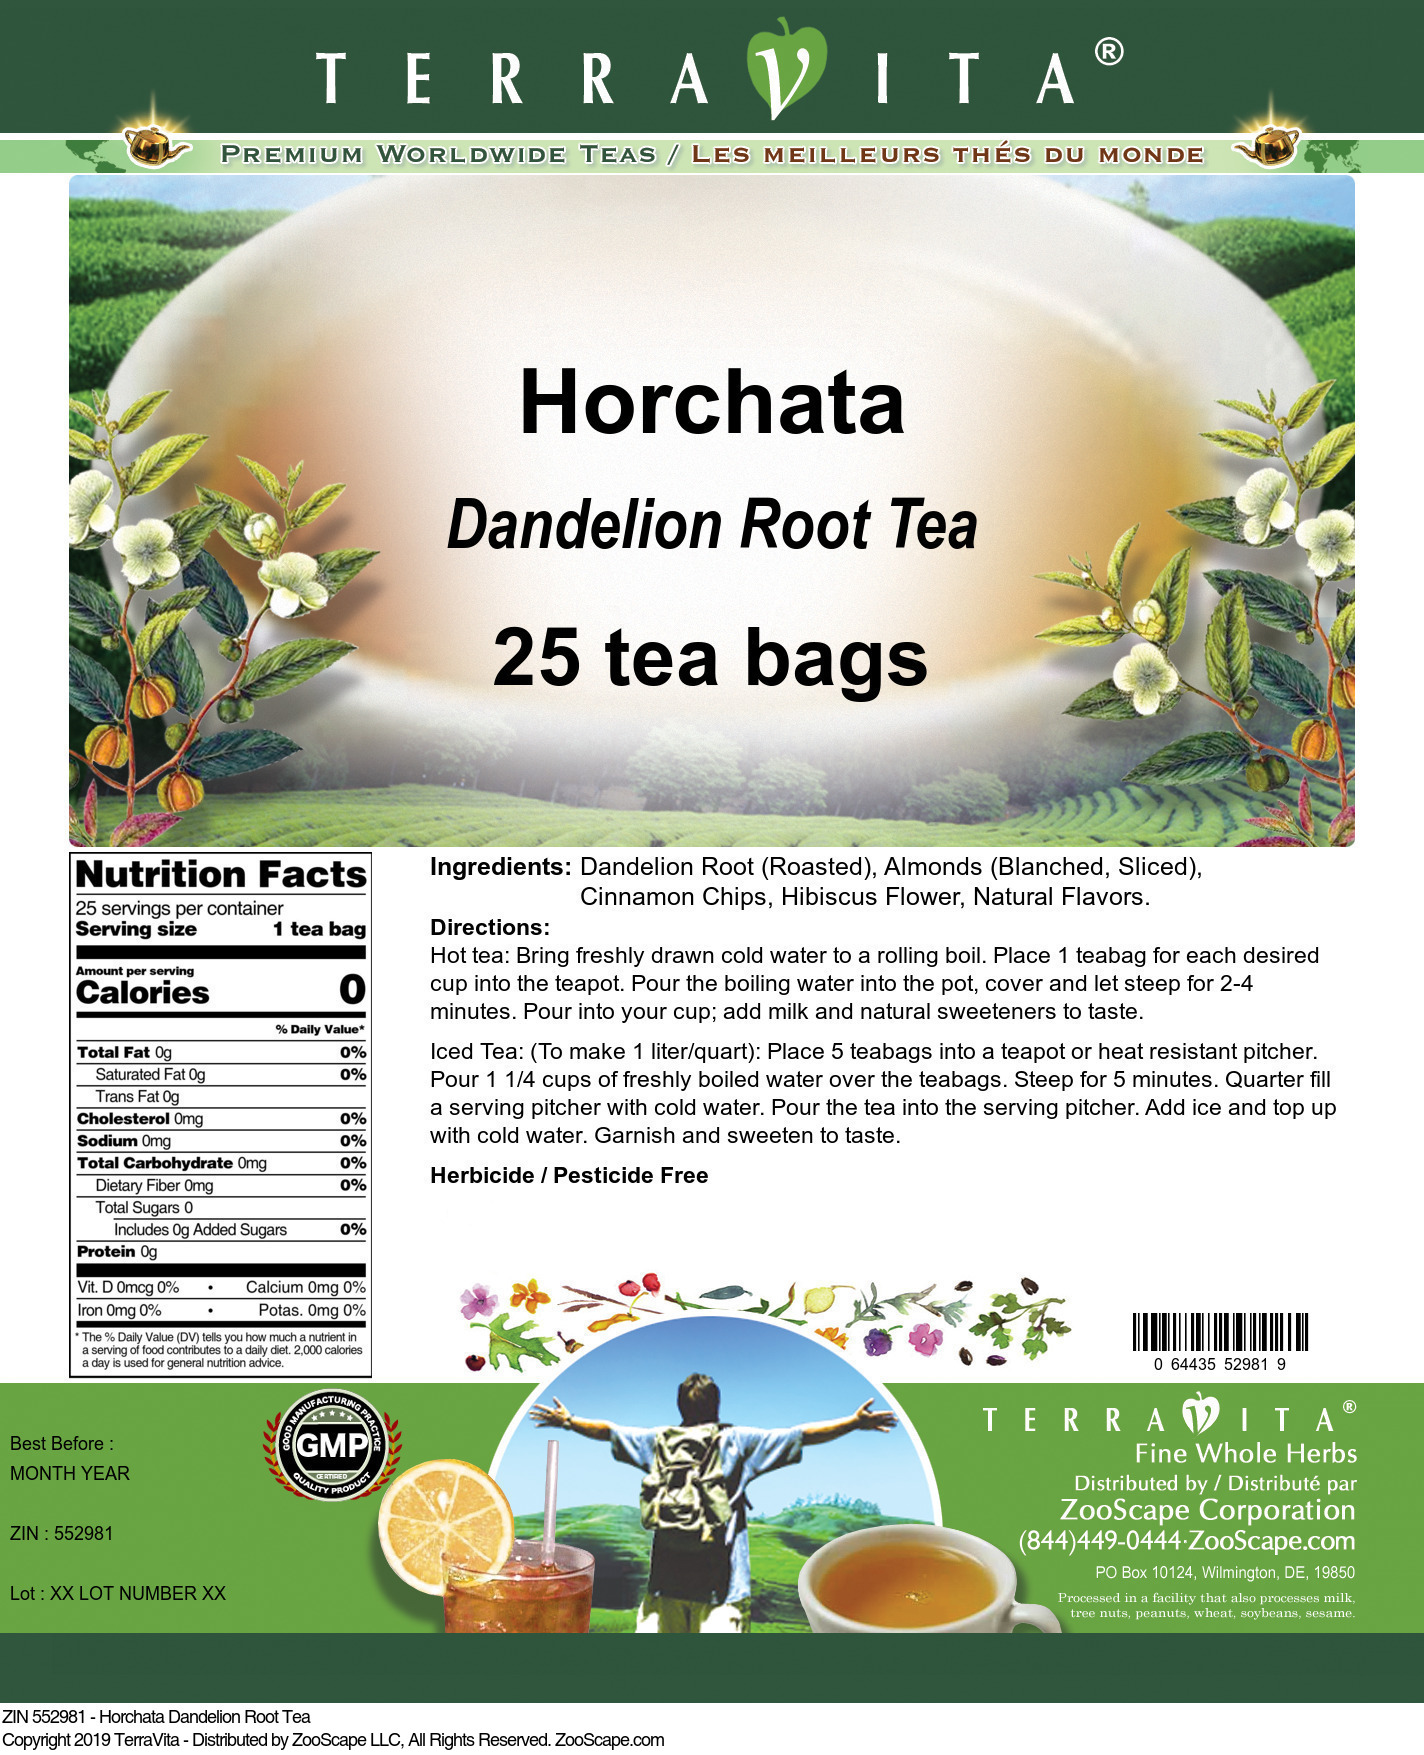 Horchata Dandelion Root Tea